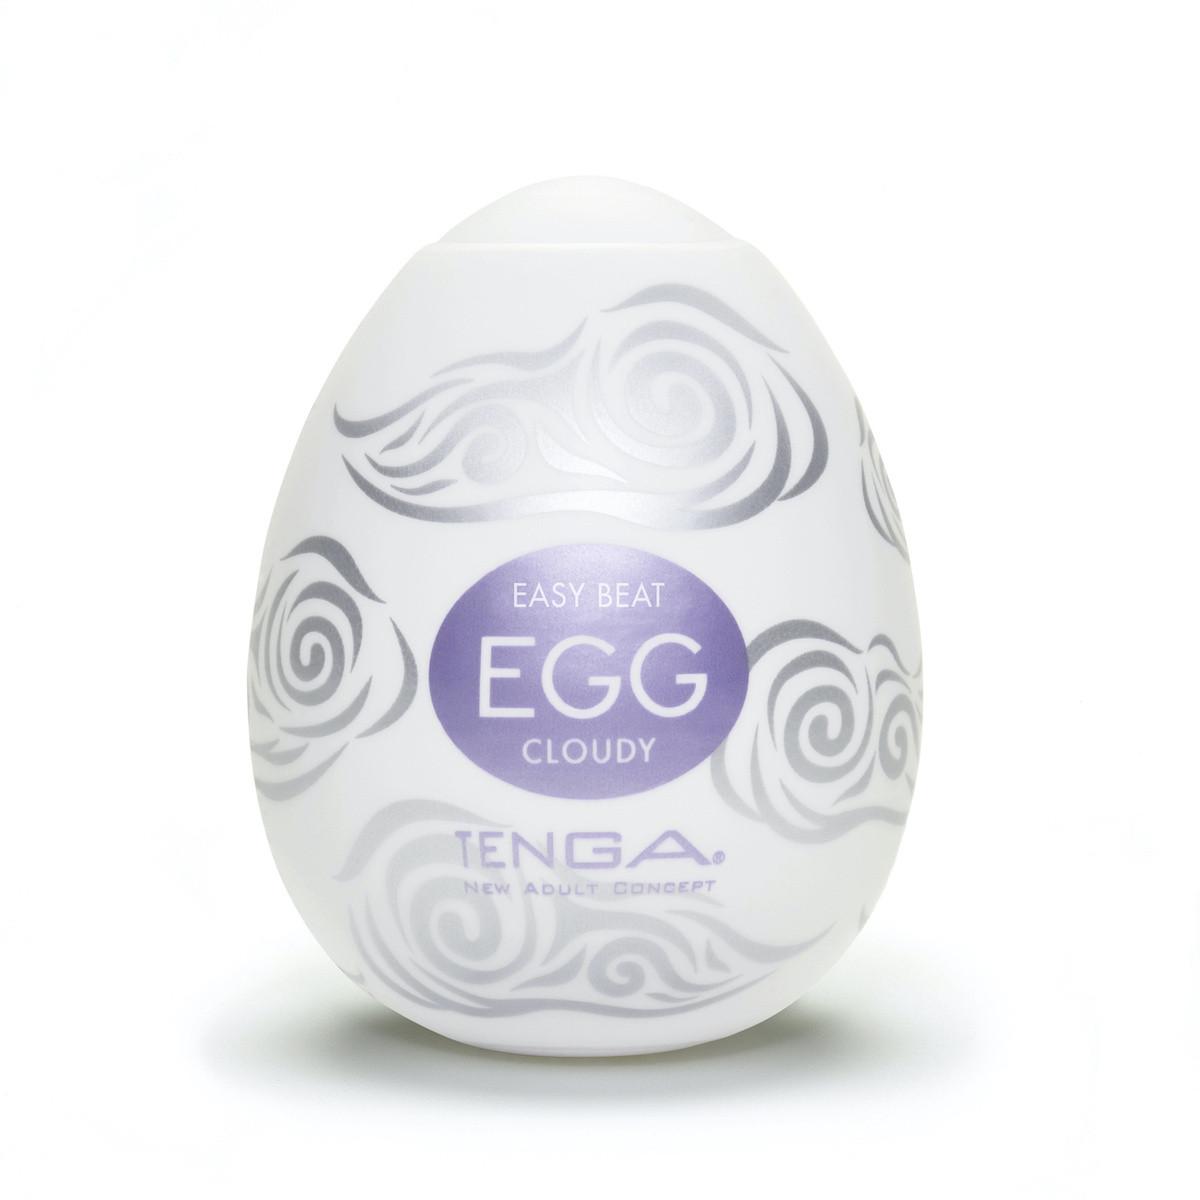 Яйцо - Мастурбатор Egg Cloudy от Tenga